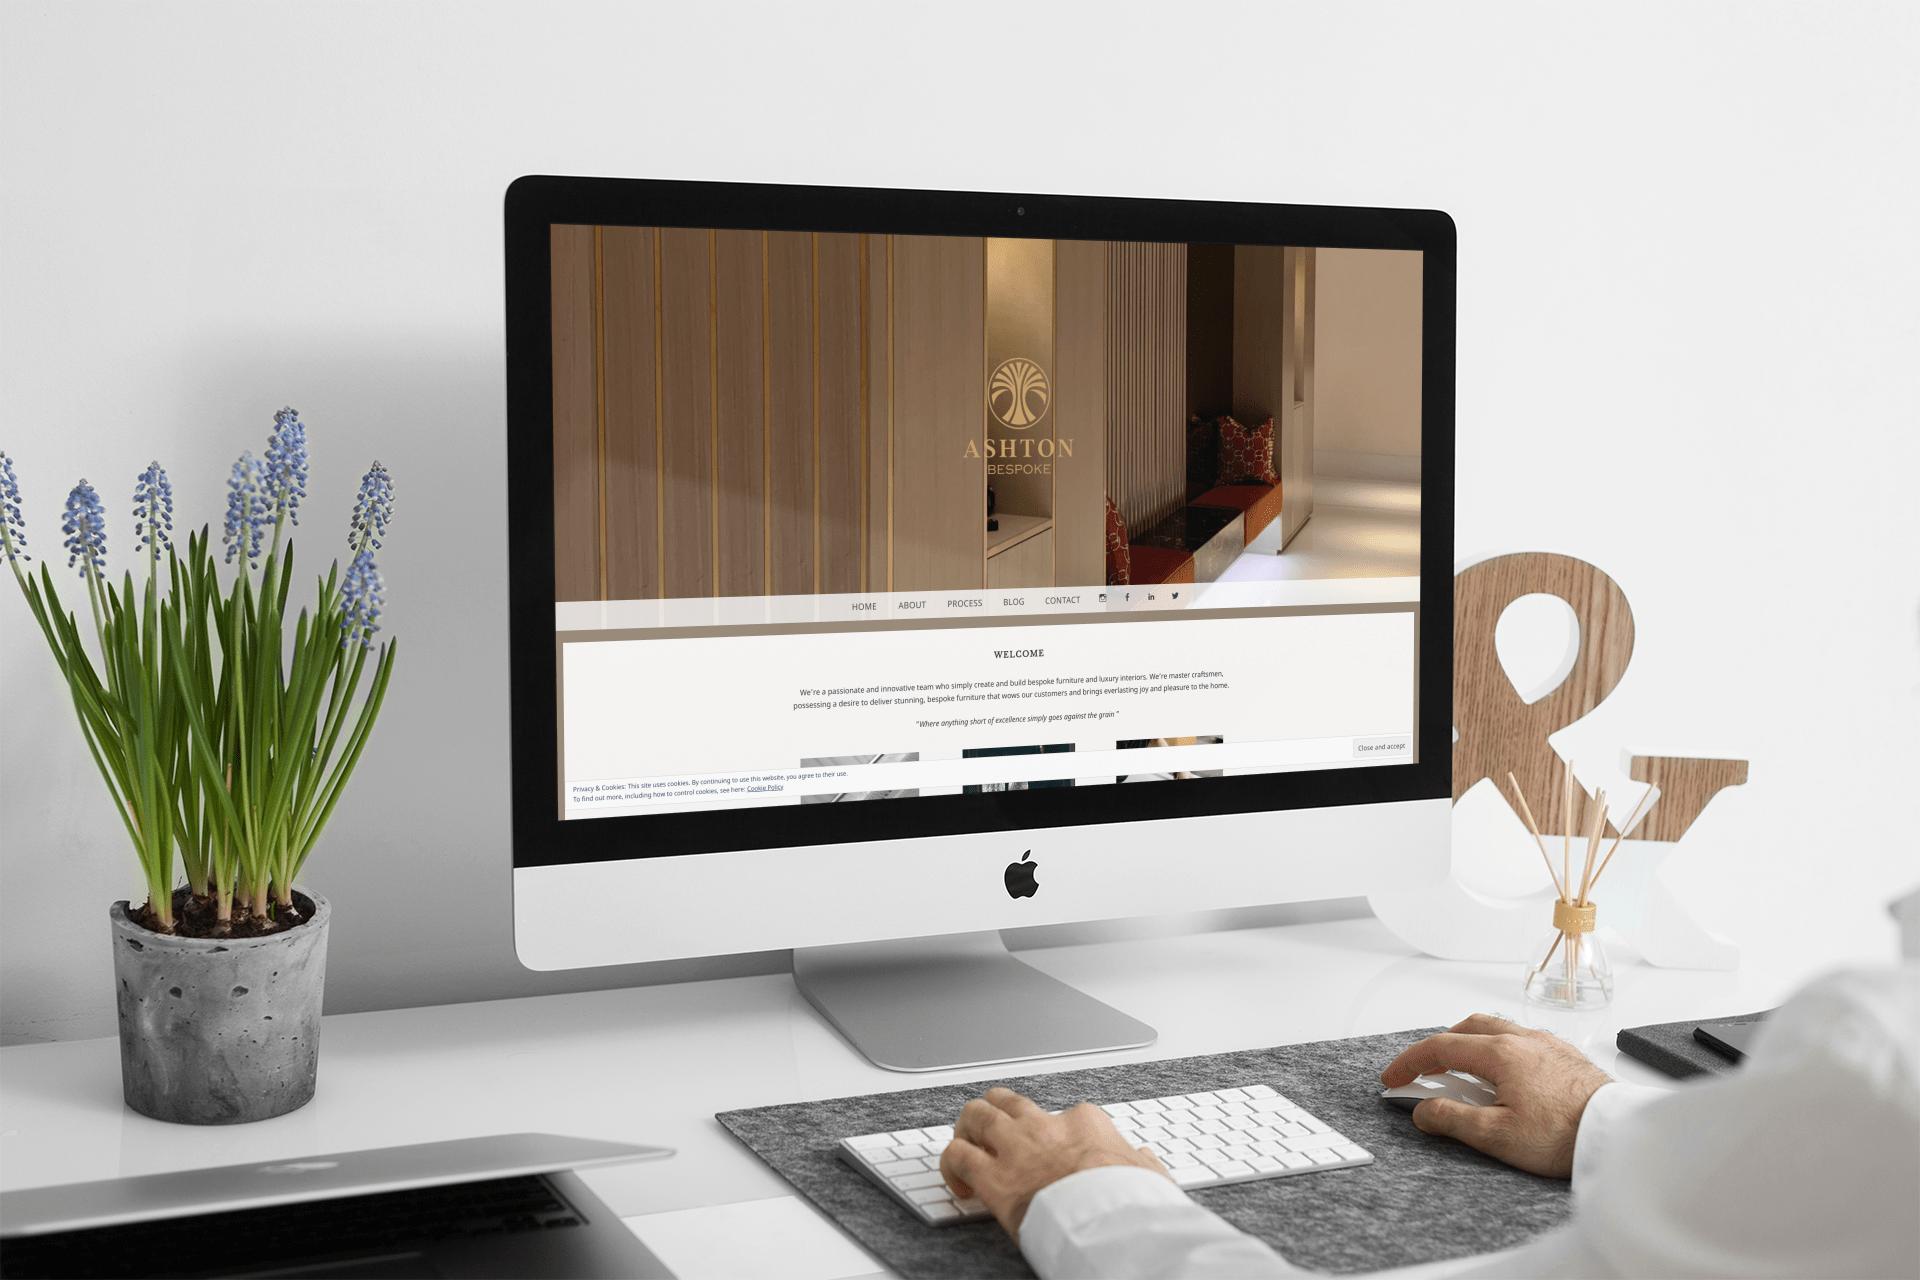 moyralla marketing website design